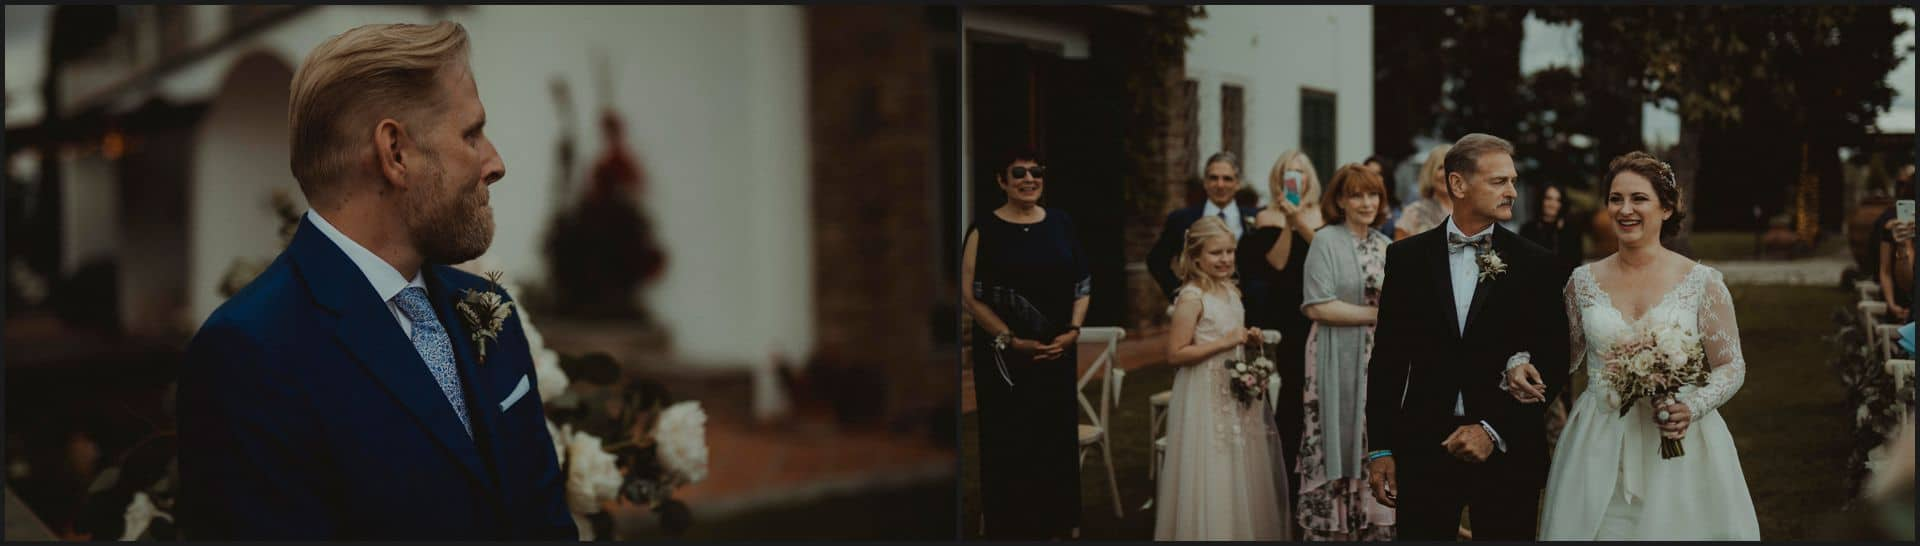 tuscany, destination wedding, chianti, walking the isle, bride, groom